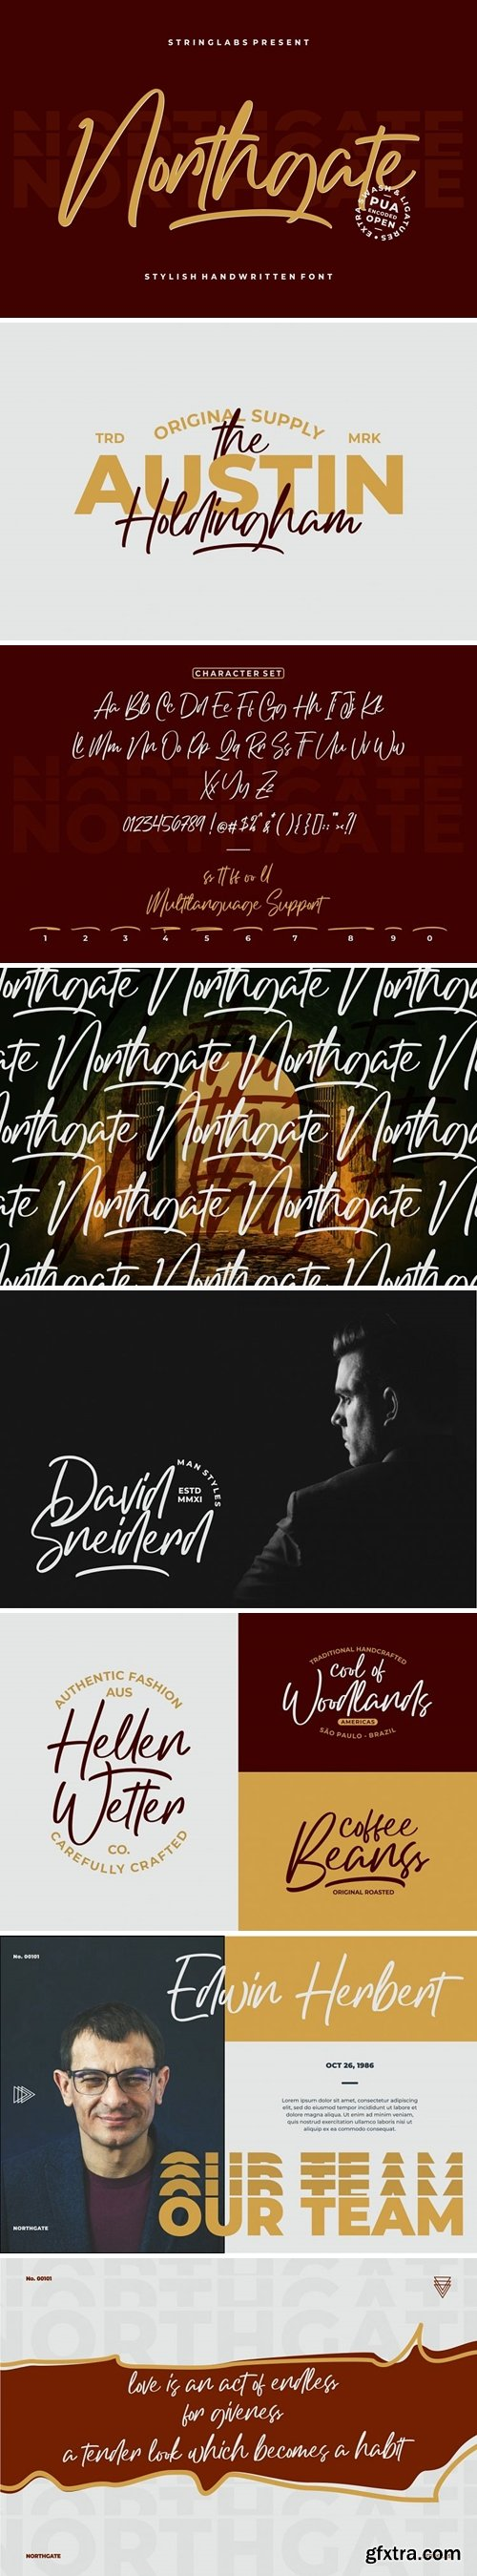 Fontbundles - Northgate - Stylish Handwritten Font 381663